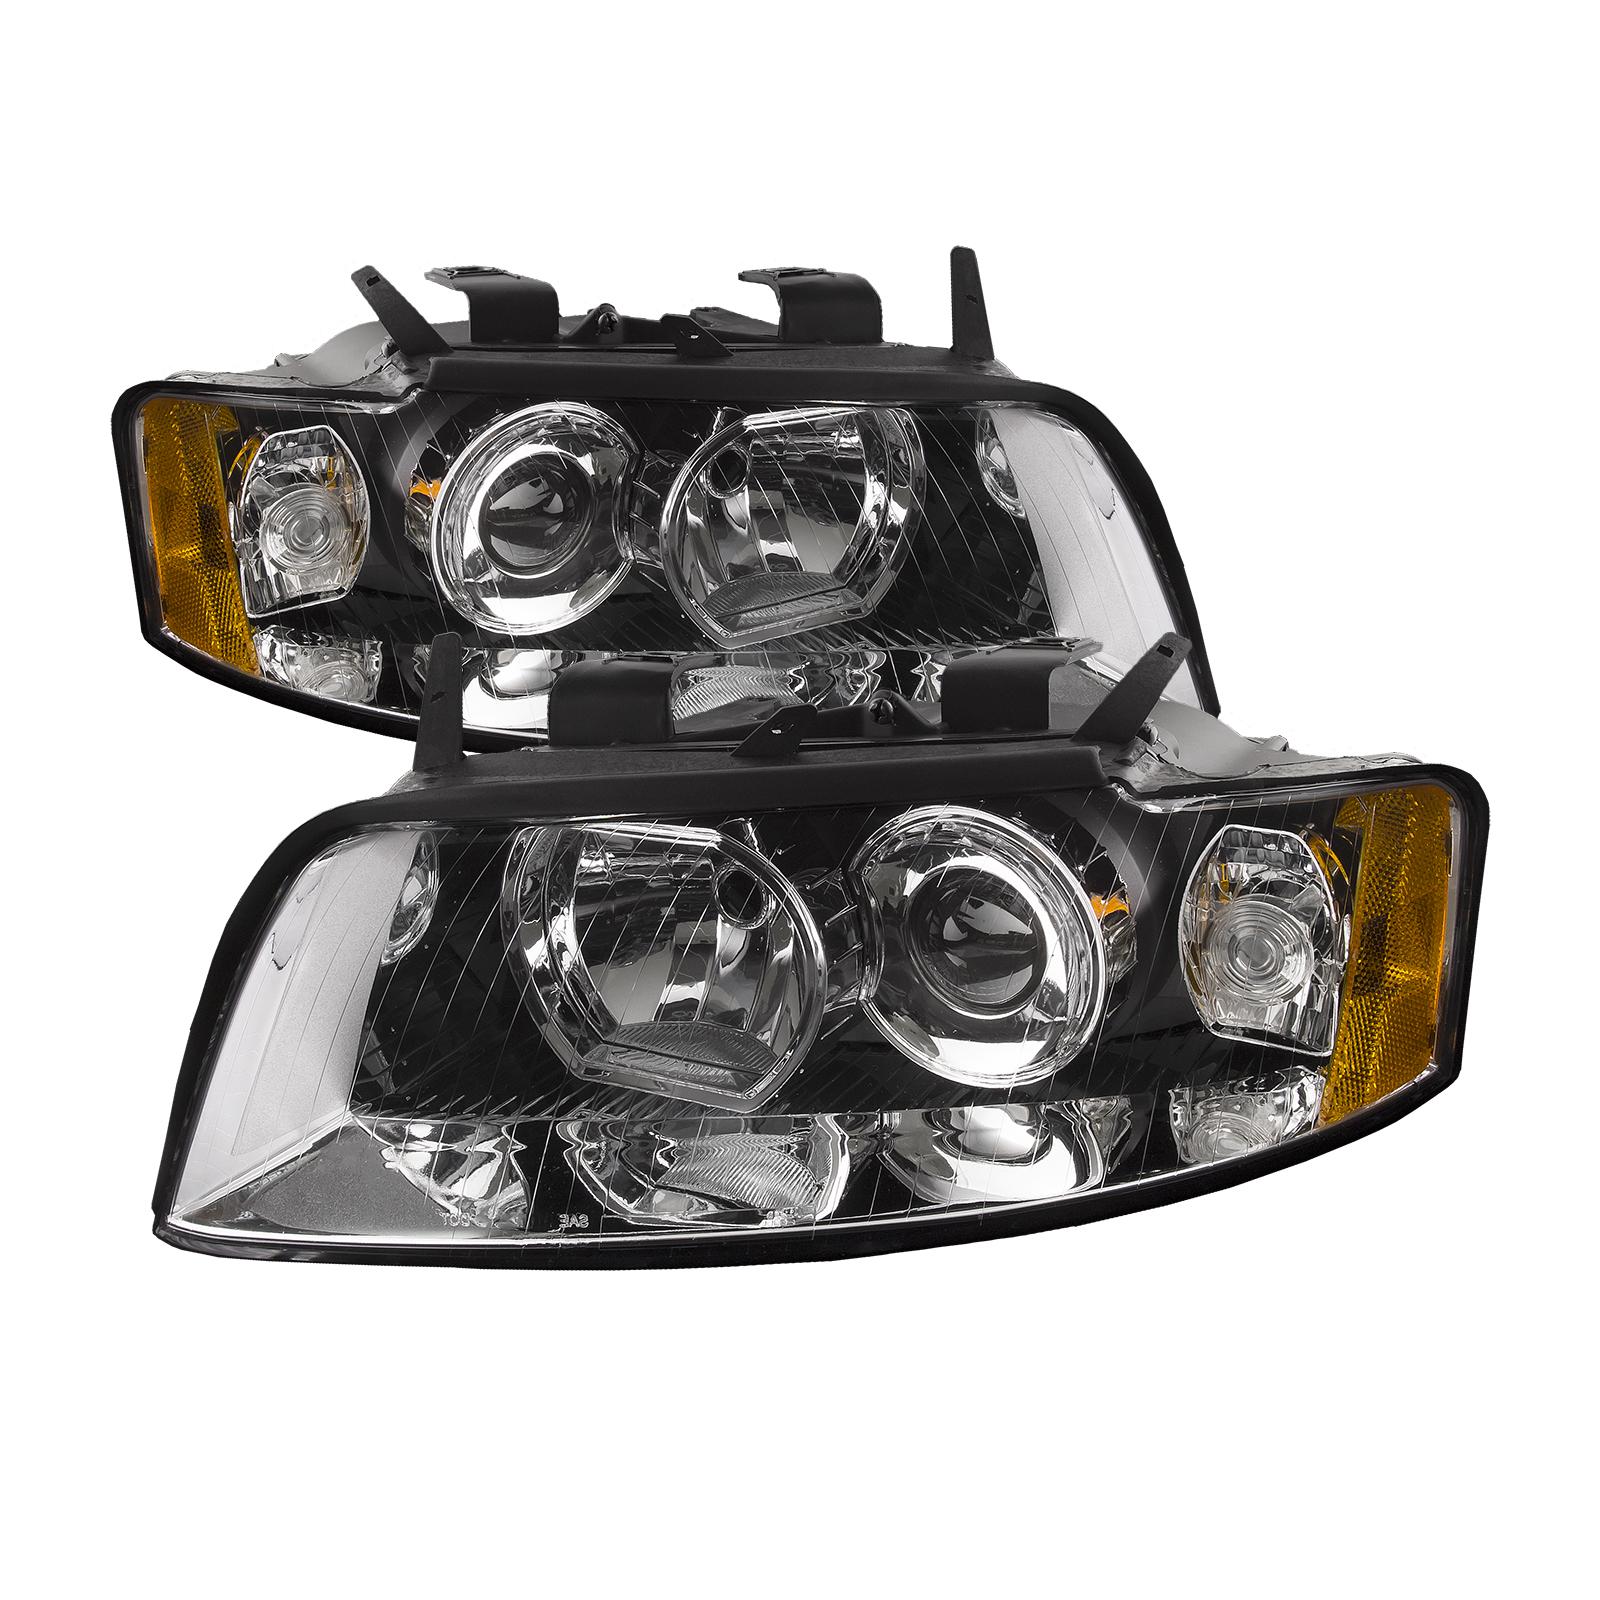 Exterior Lighting Automotive Tiffin Phaeton 2005-2007 RV Motorhome ...